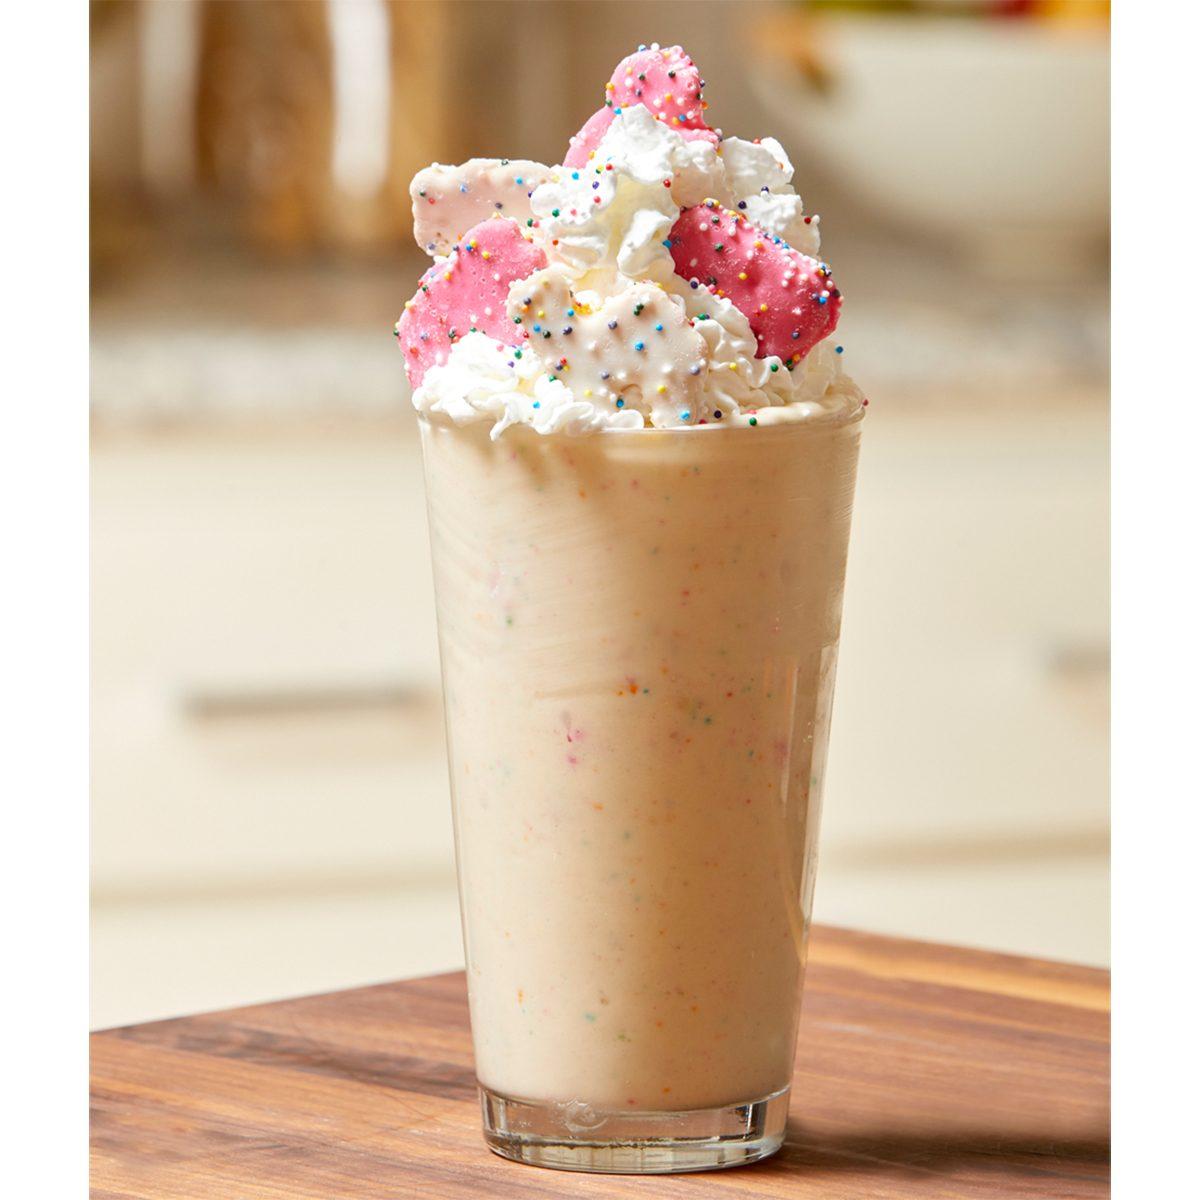 12 Crazy Milkshakes We're Drooling Over